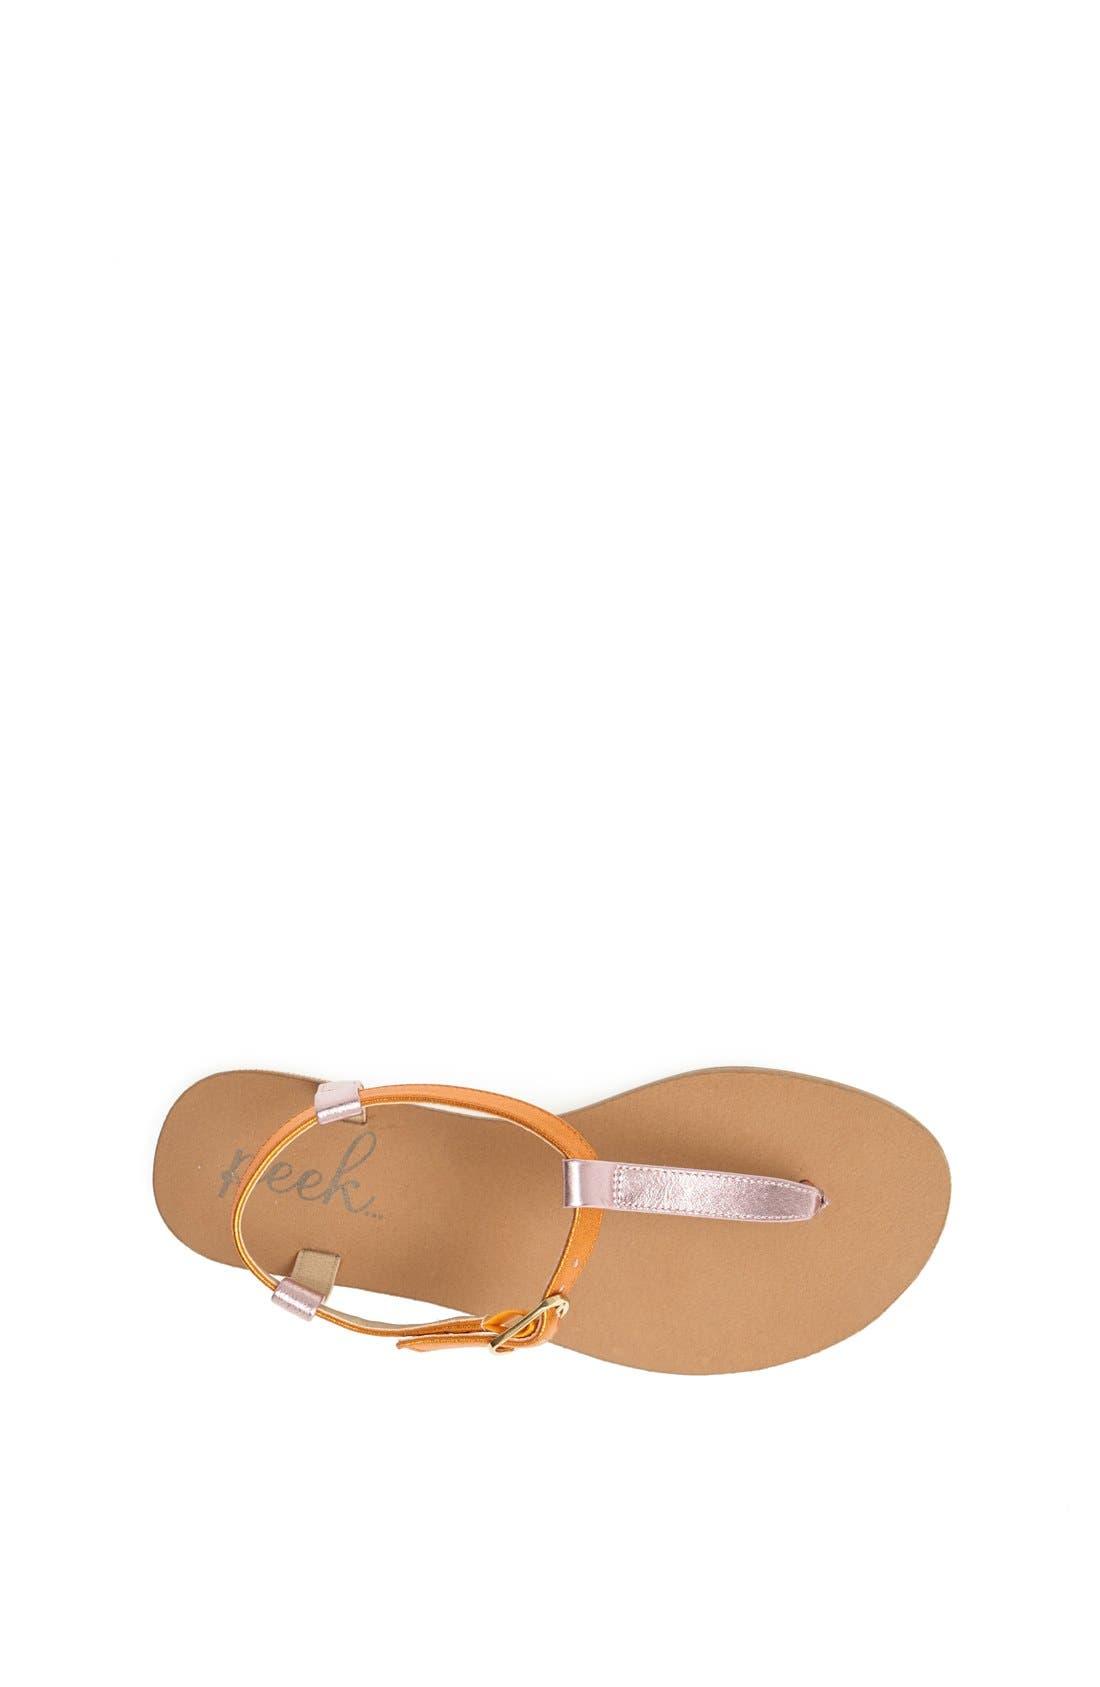 Alternate Image 3  - Peek 'Arabella' Sandal (Toddler, Little Kid & Big Kid)